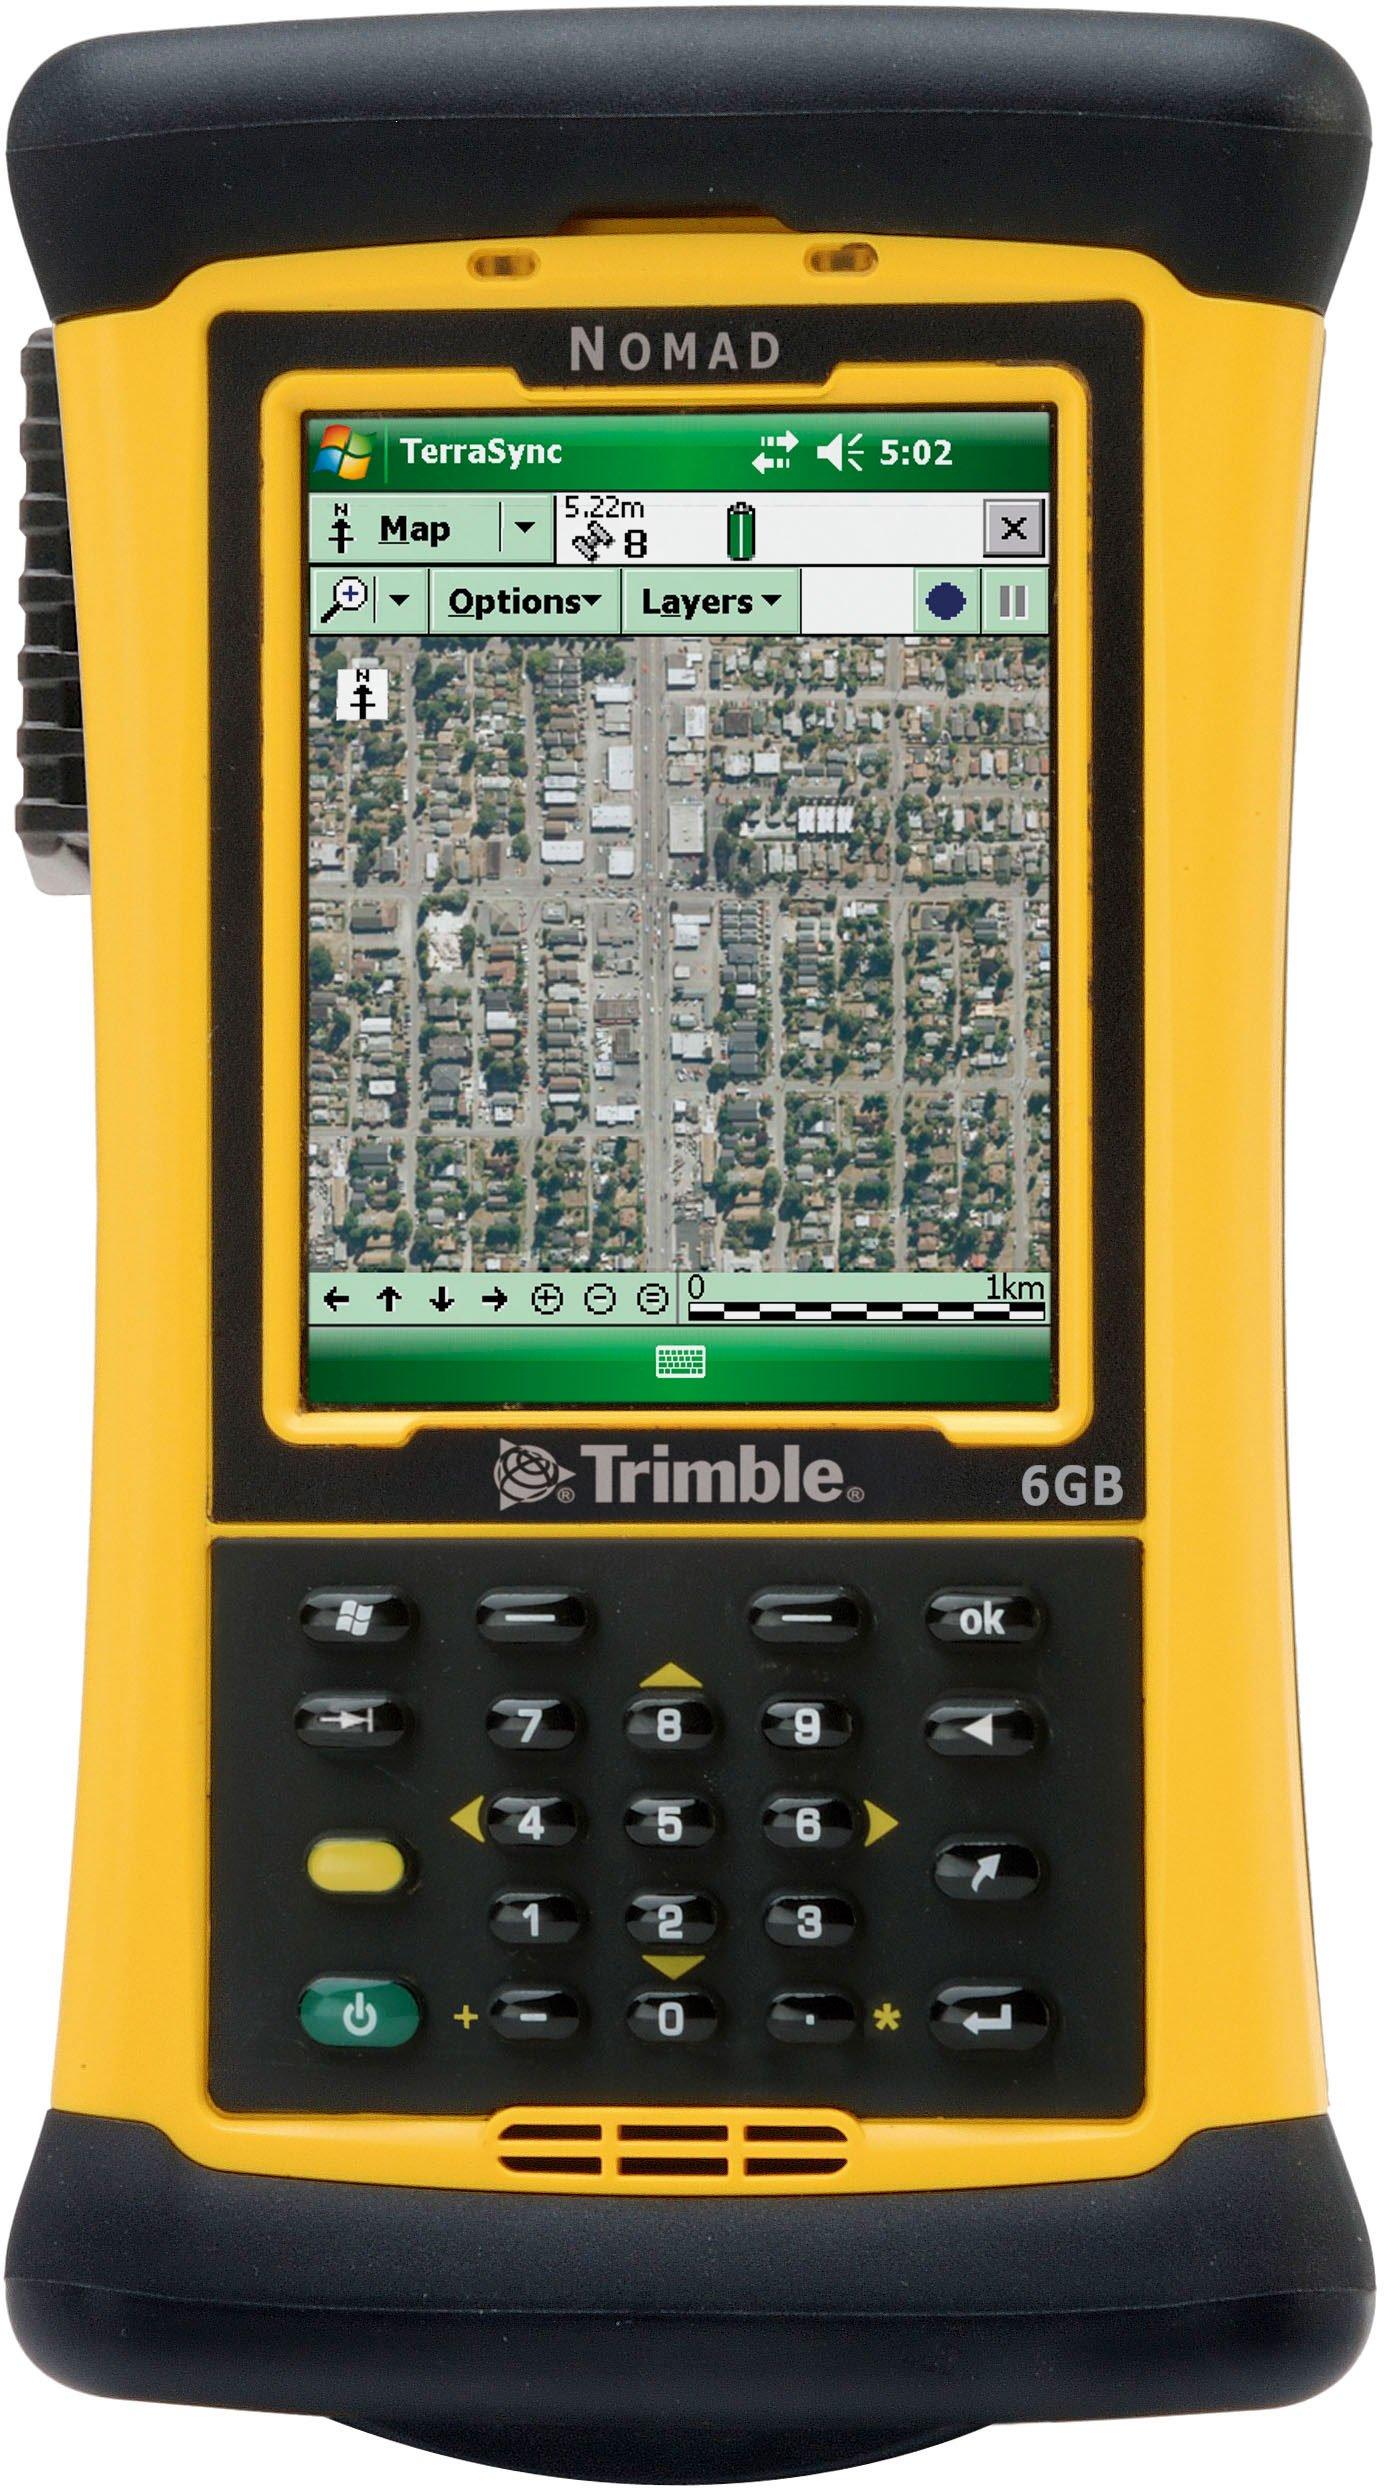 Trimble Navigation Nomad 900B Rugged Handheld Computer Numeric Keypad 806MHz Processor, 128MB RAM/512MB Flash, 5200mAh Lithium-ion Battery NMDAAG-111-00 by Trimble Navigation by TRIMBLE (Image #1)